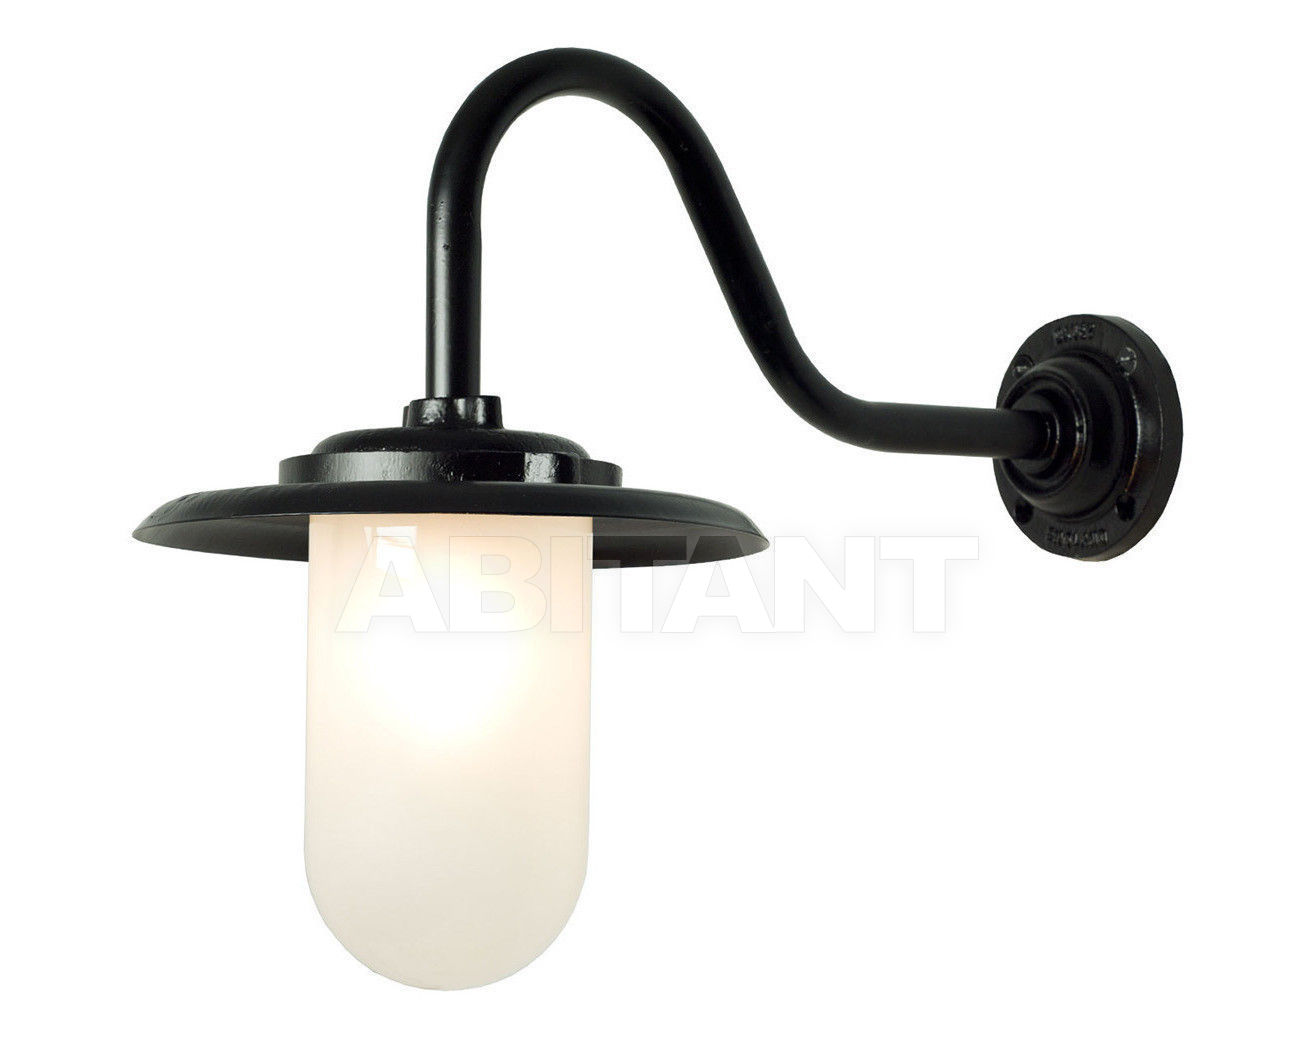 Купить Фонарь Davey Lighting Wall Mounted Lights 7677/BL/100F/S